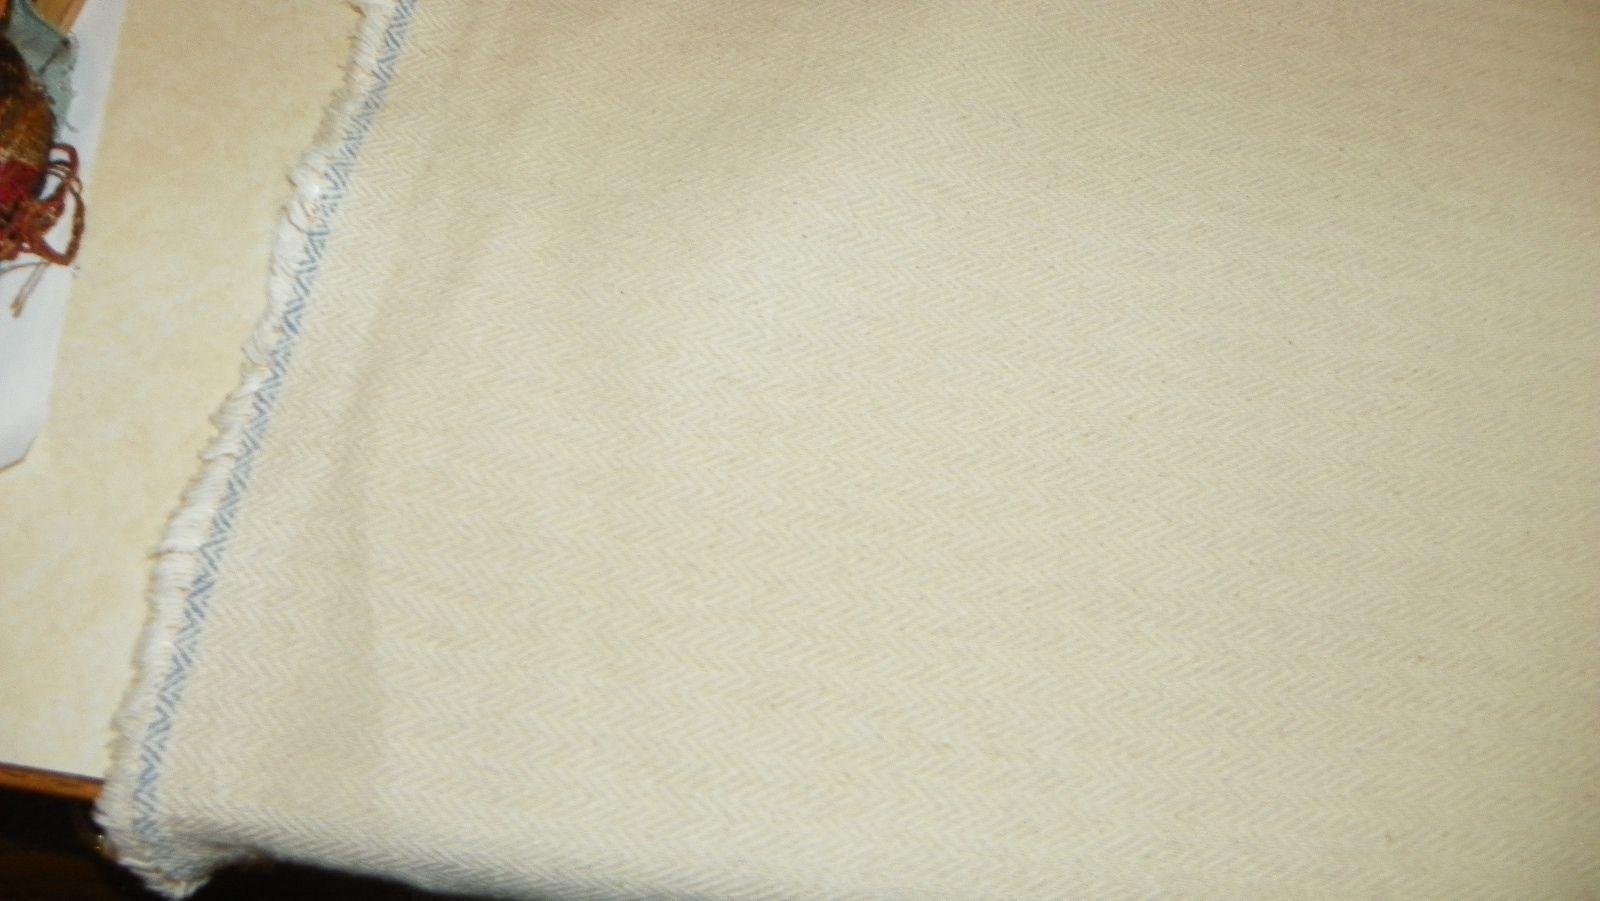 Off White Chevron Nylon Upholstery Fabric  1 Yard  R408